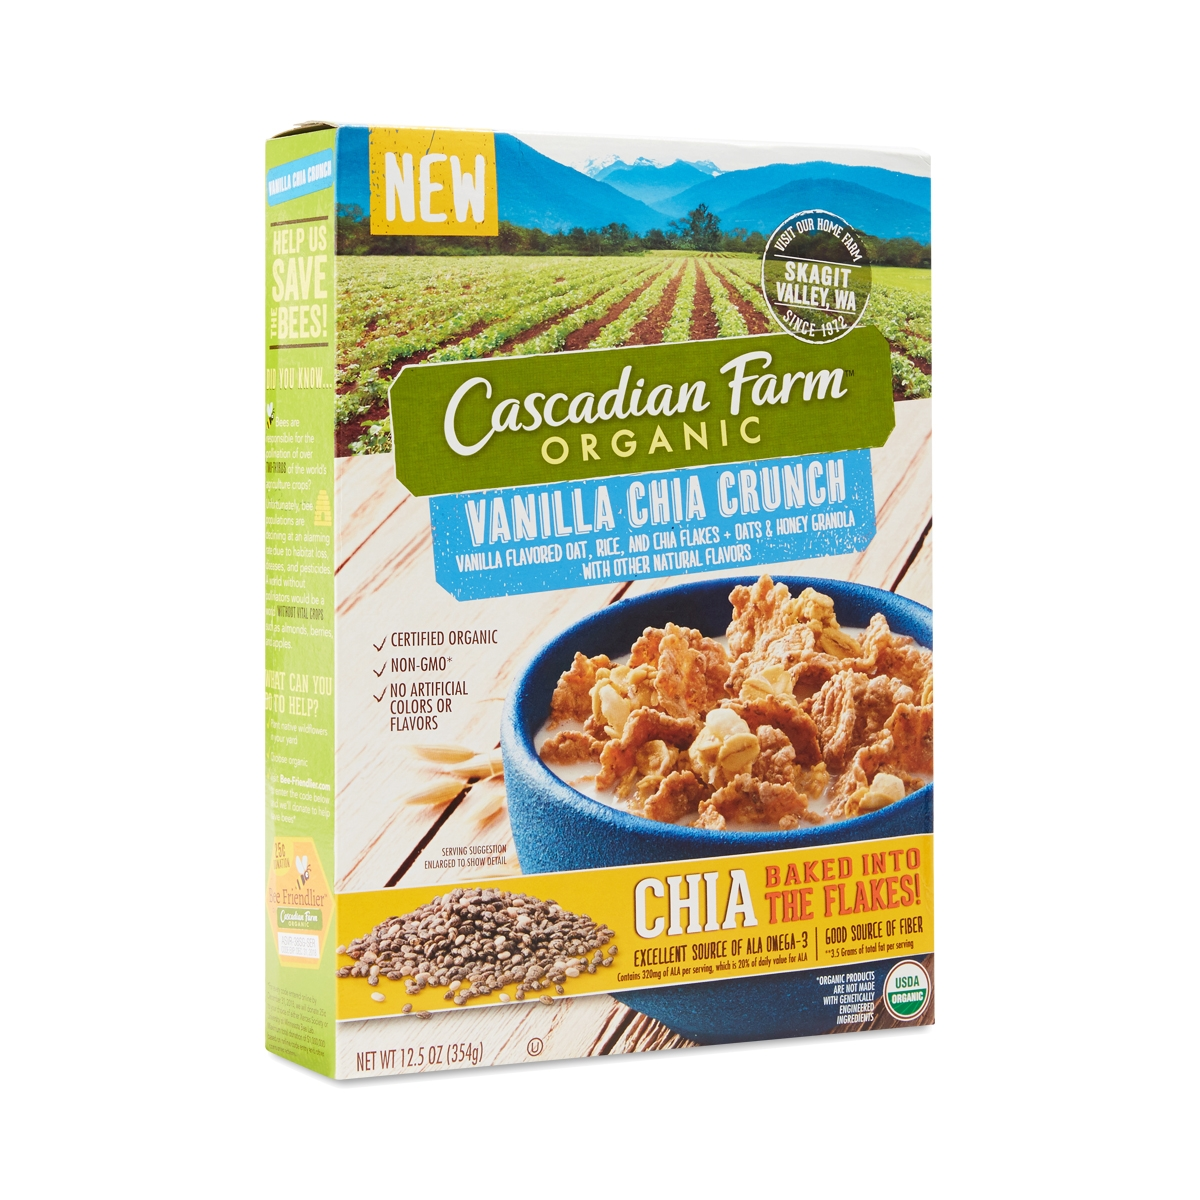 Organic Vanilla Chia Crunch Cereal By Cascadian Farms